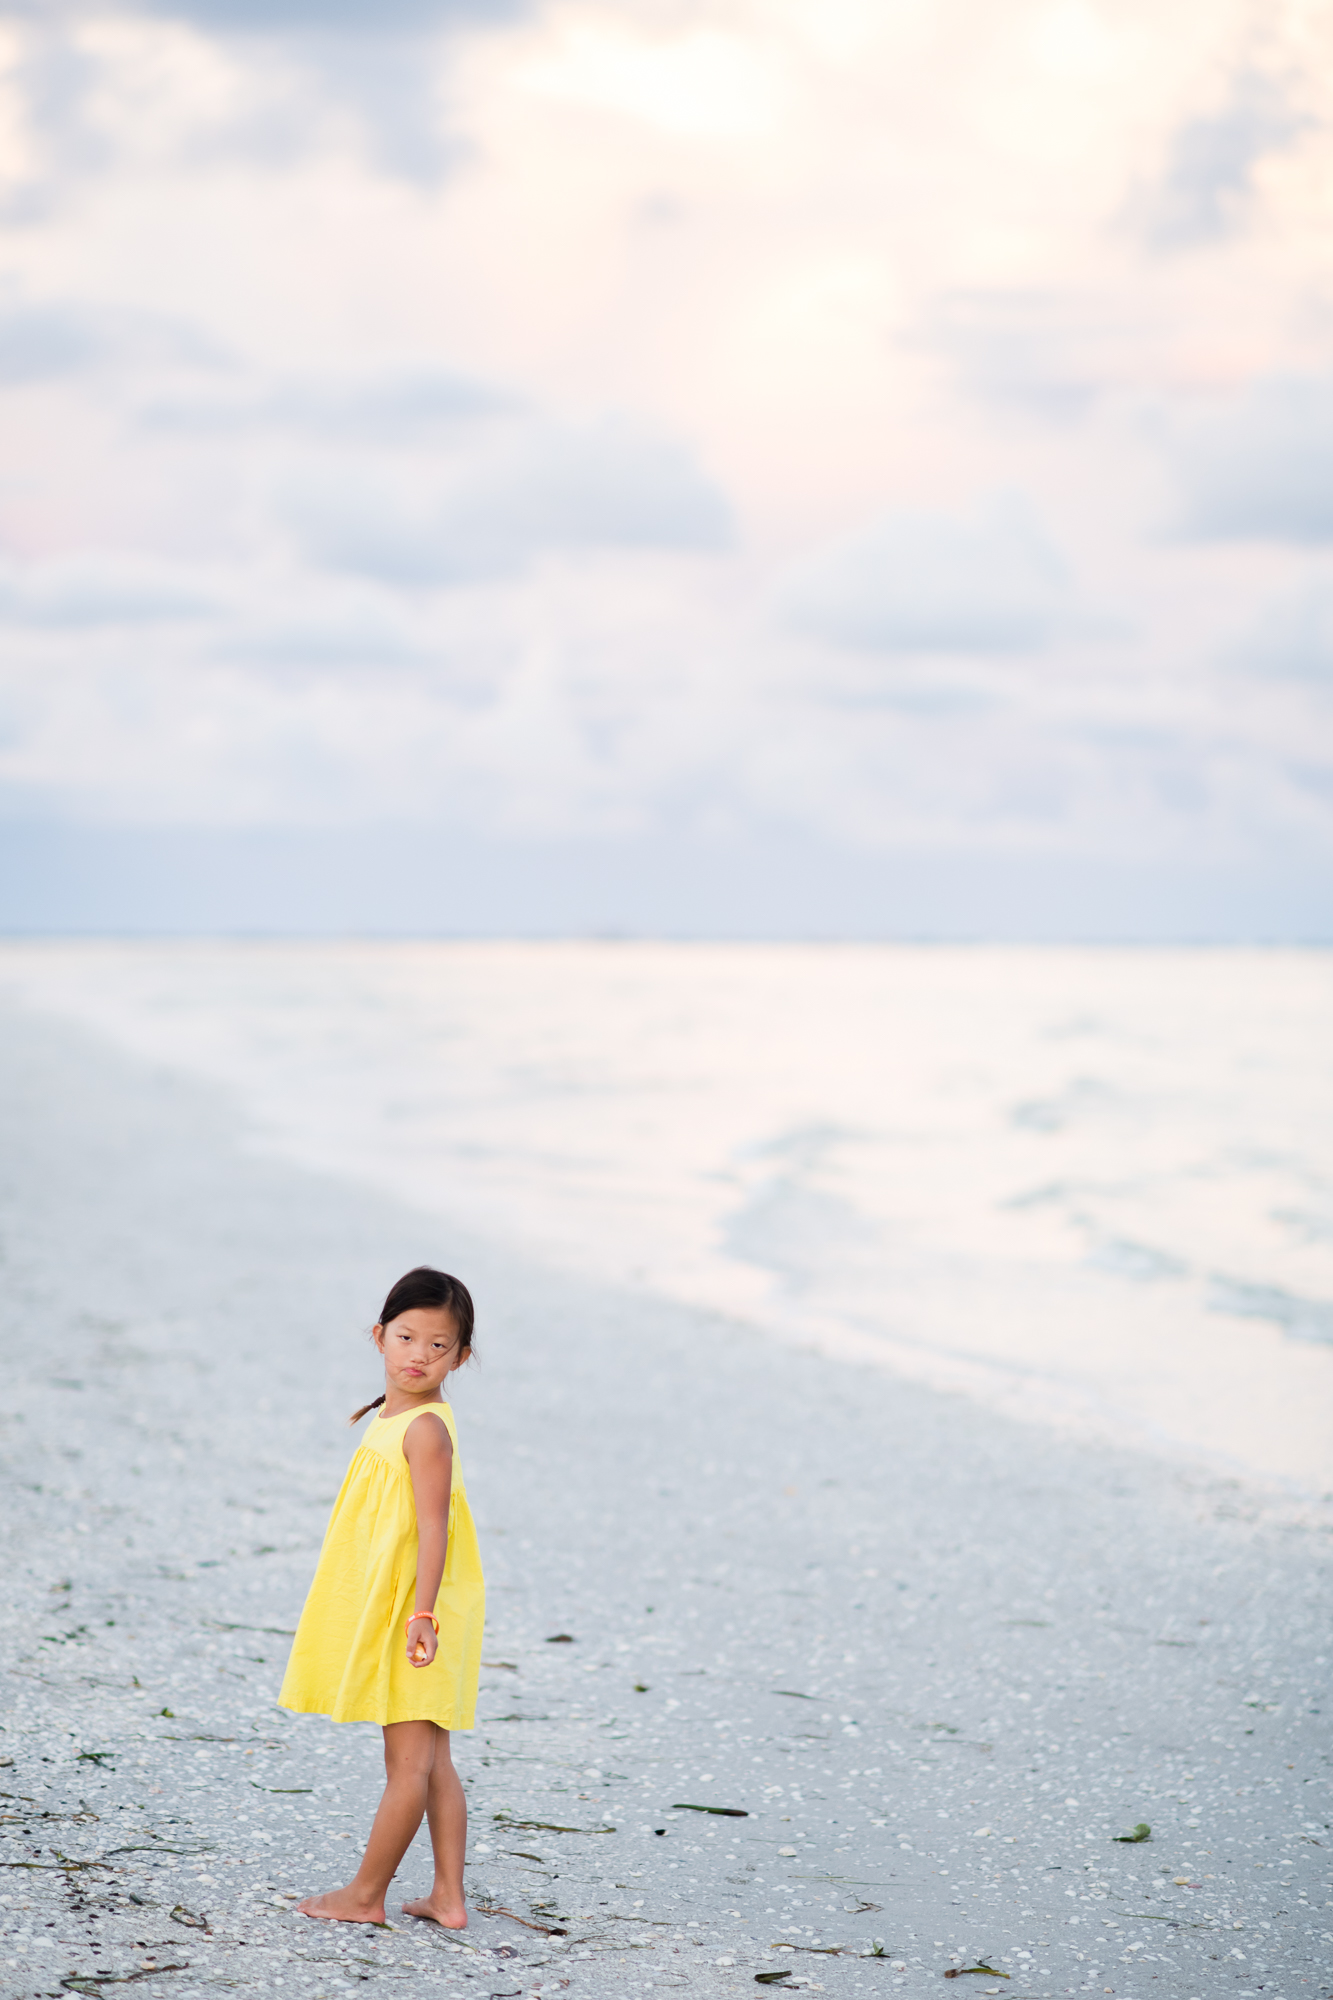 sanibel-island-beach-feeling-sick-2.jpg